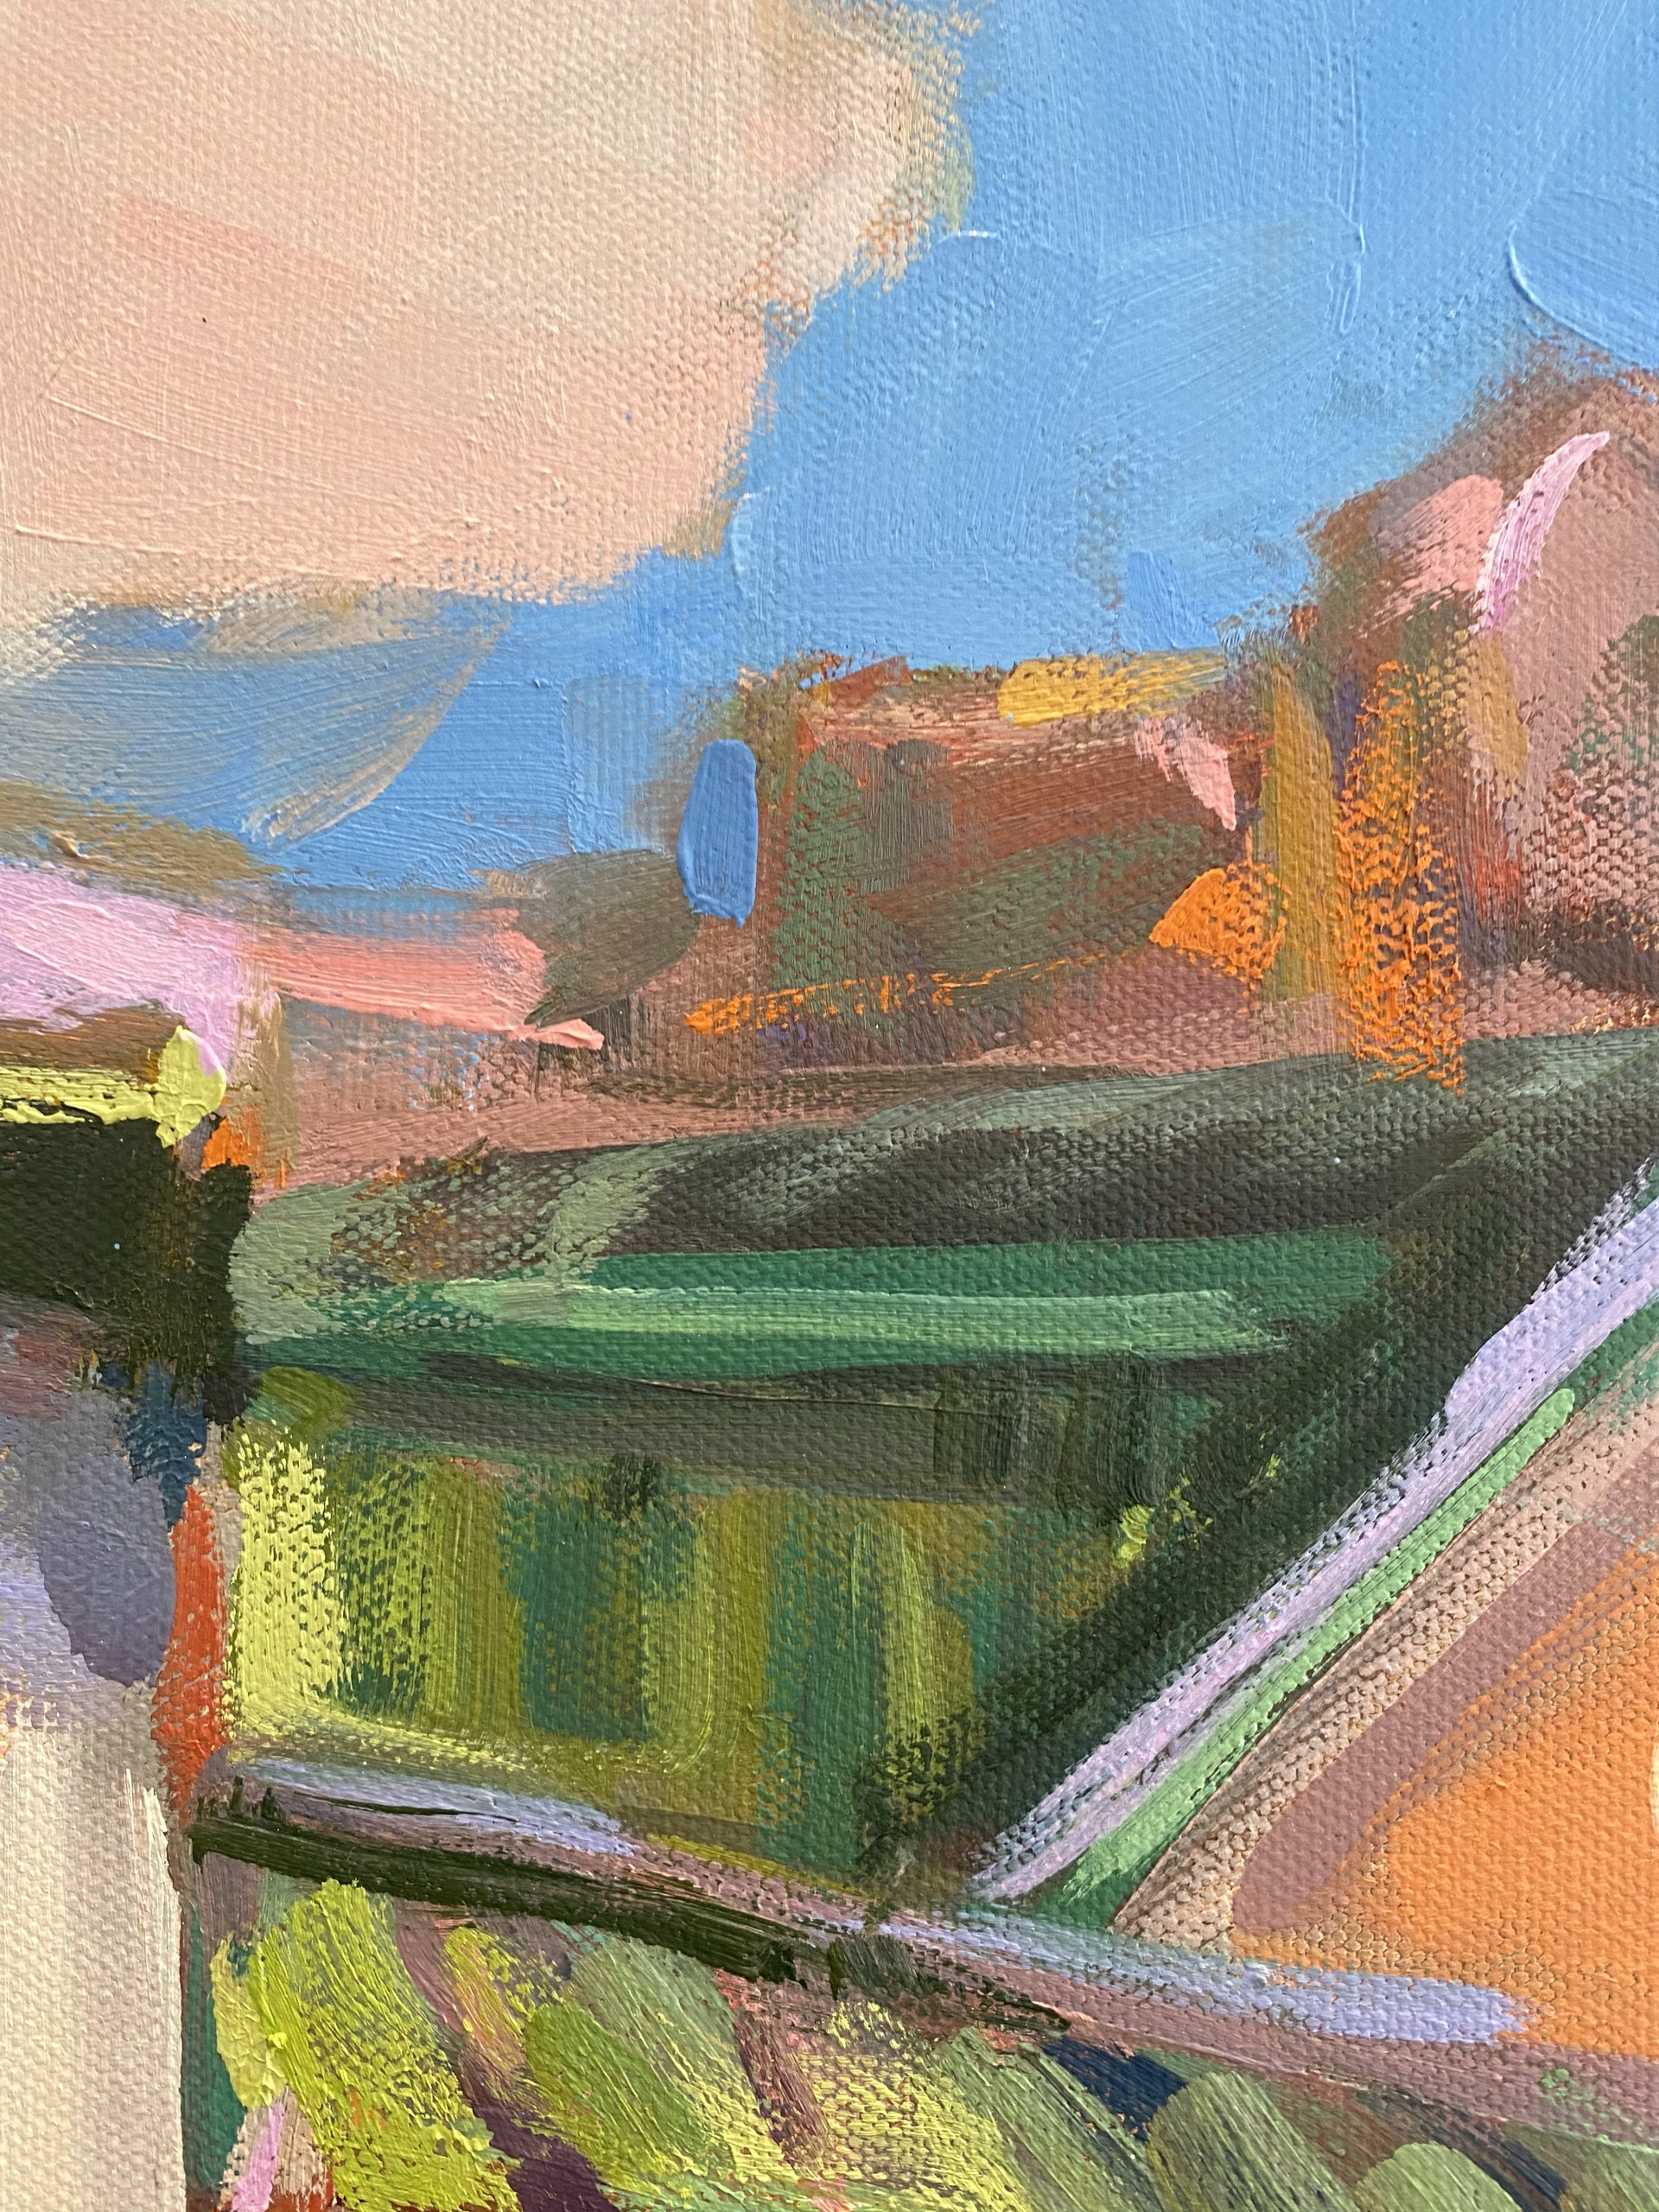 Elliott Street by Marissa Vogl